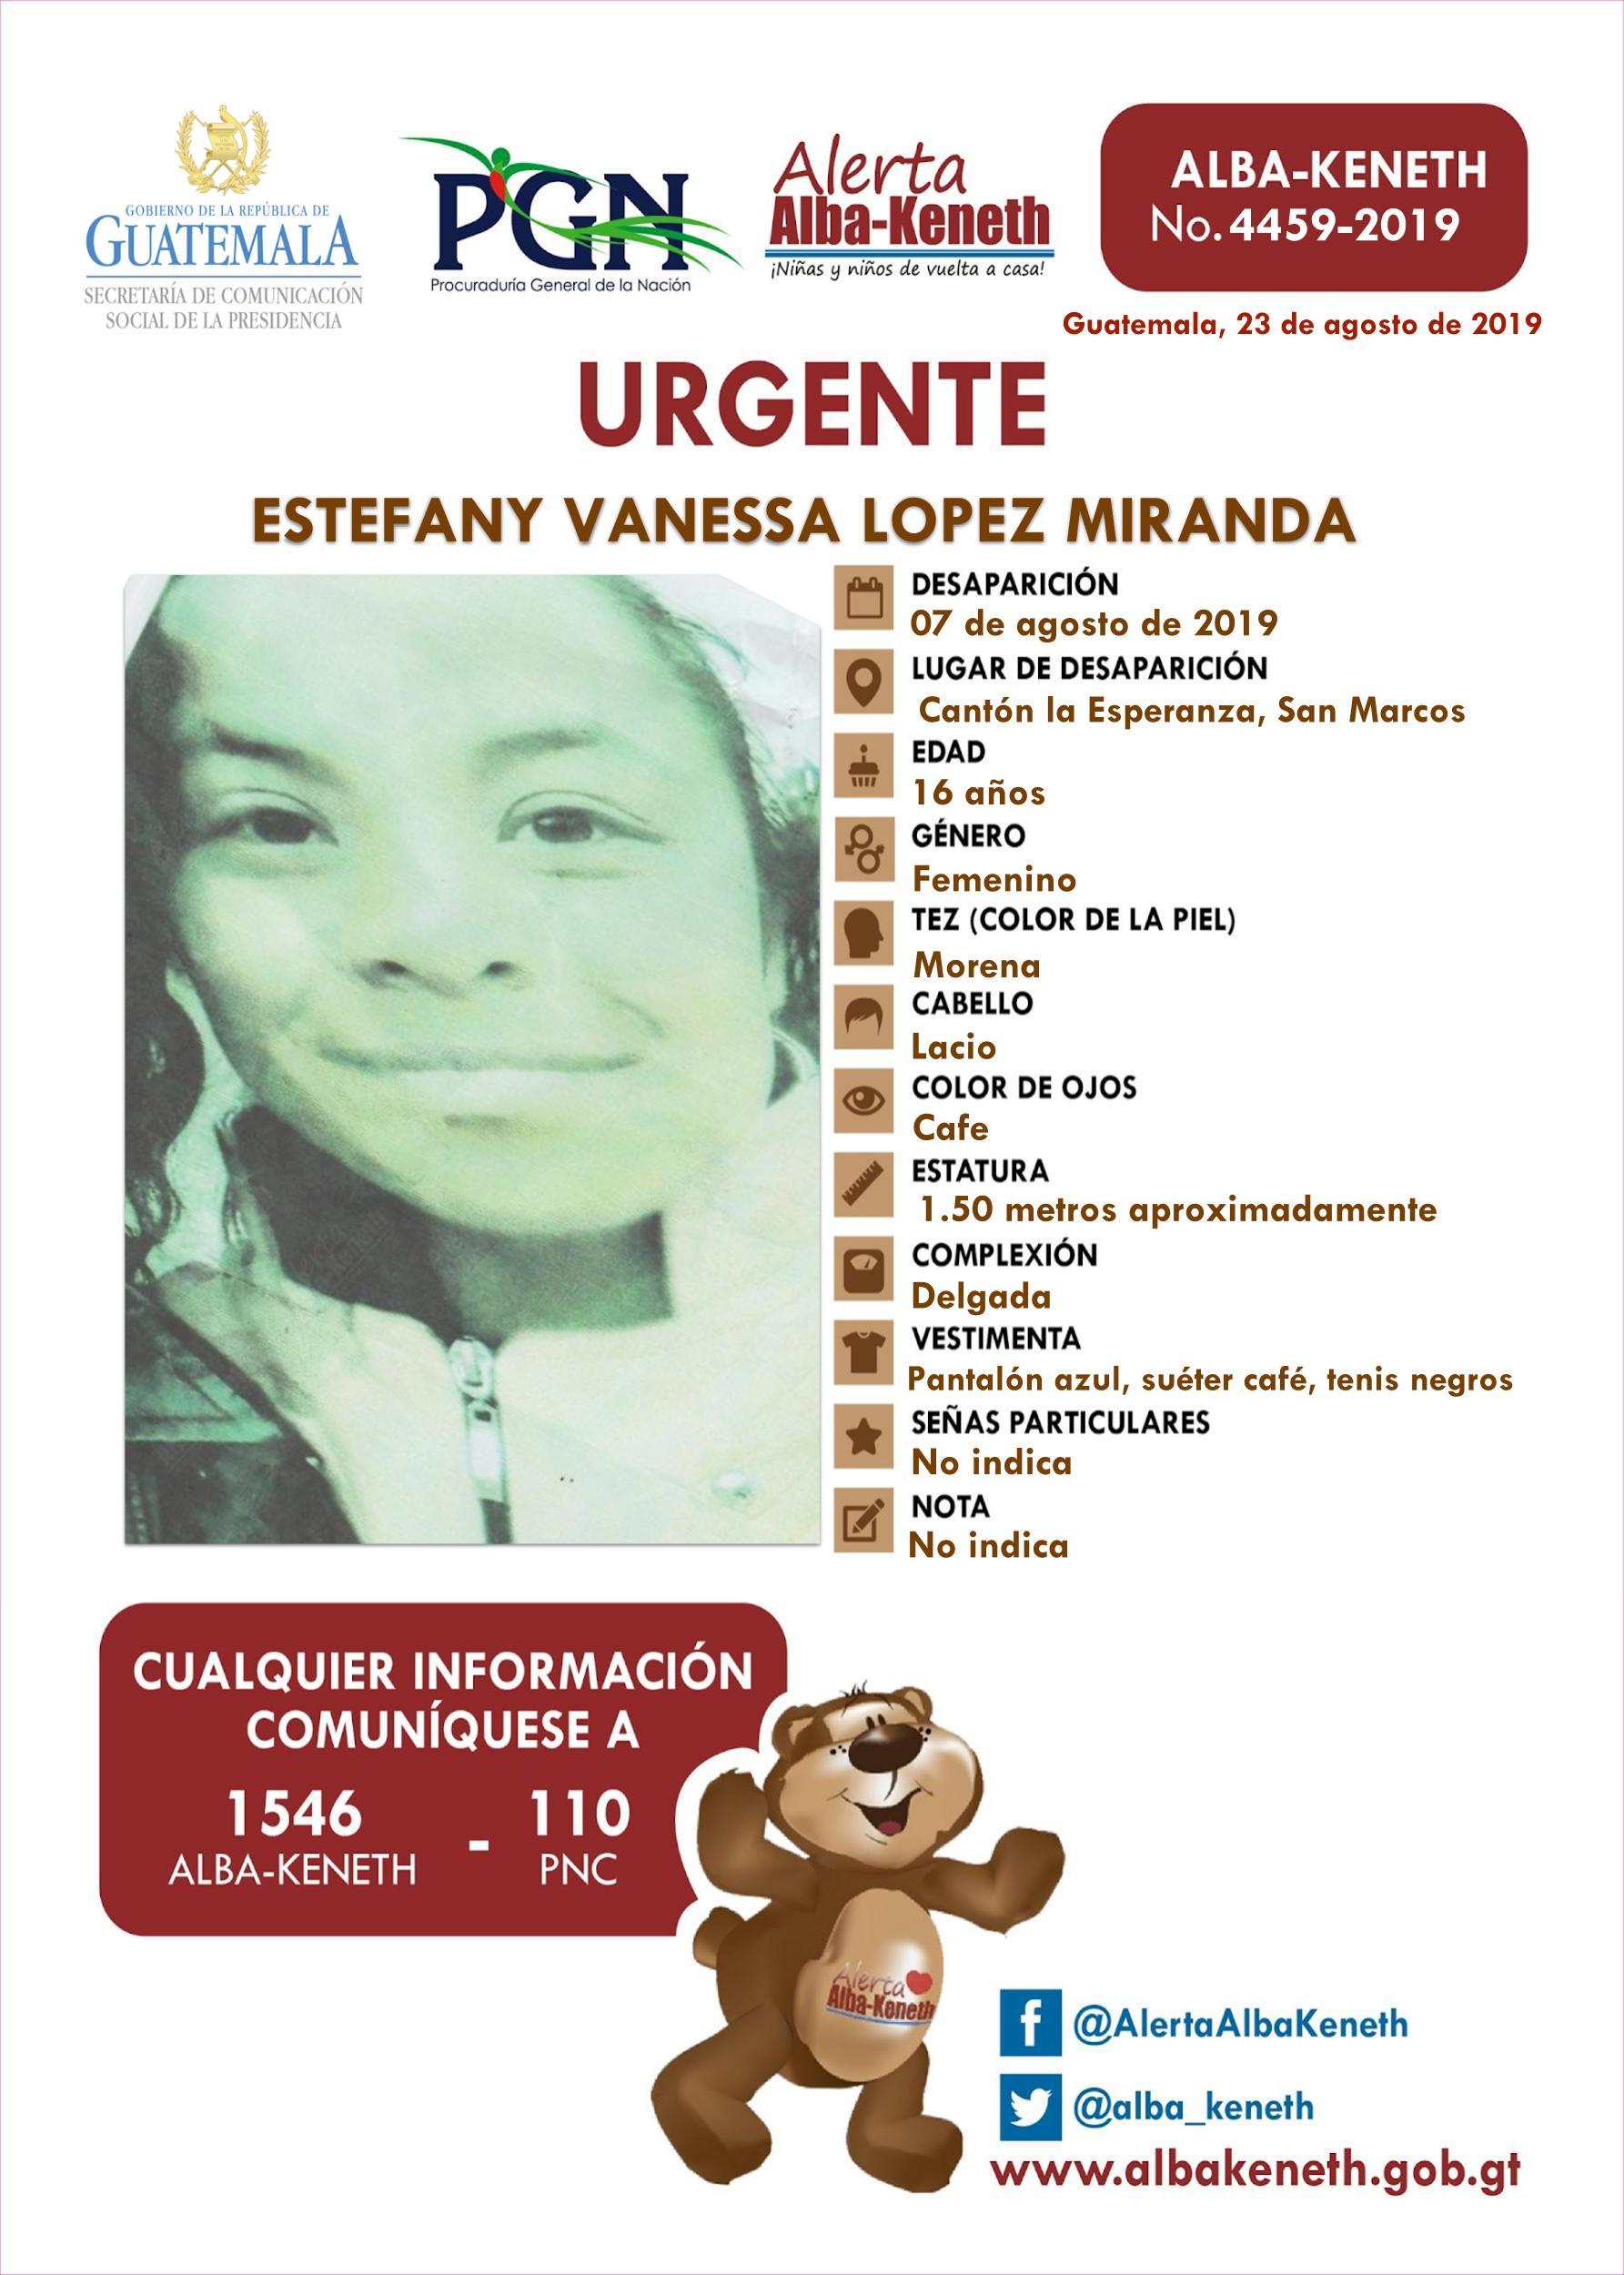 Estefany Vanessa Lopez Miranda